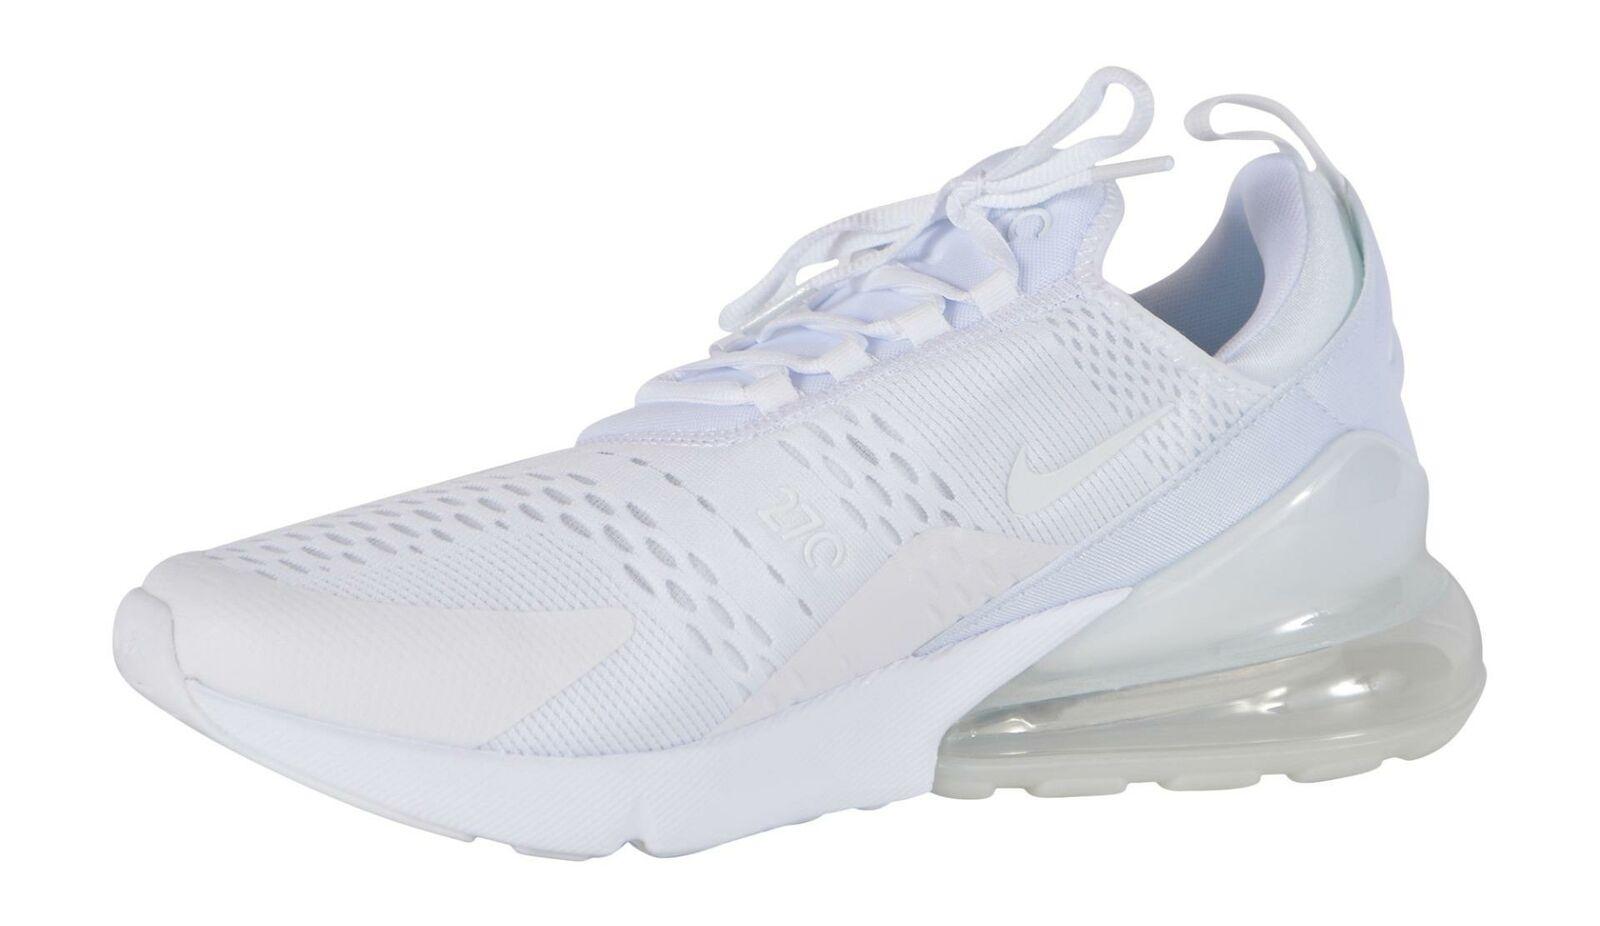 New Nike Air Max 270 Men's Triple White Mesh Running Shoes AH8050 101